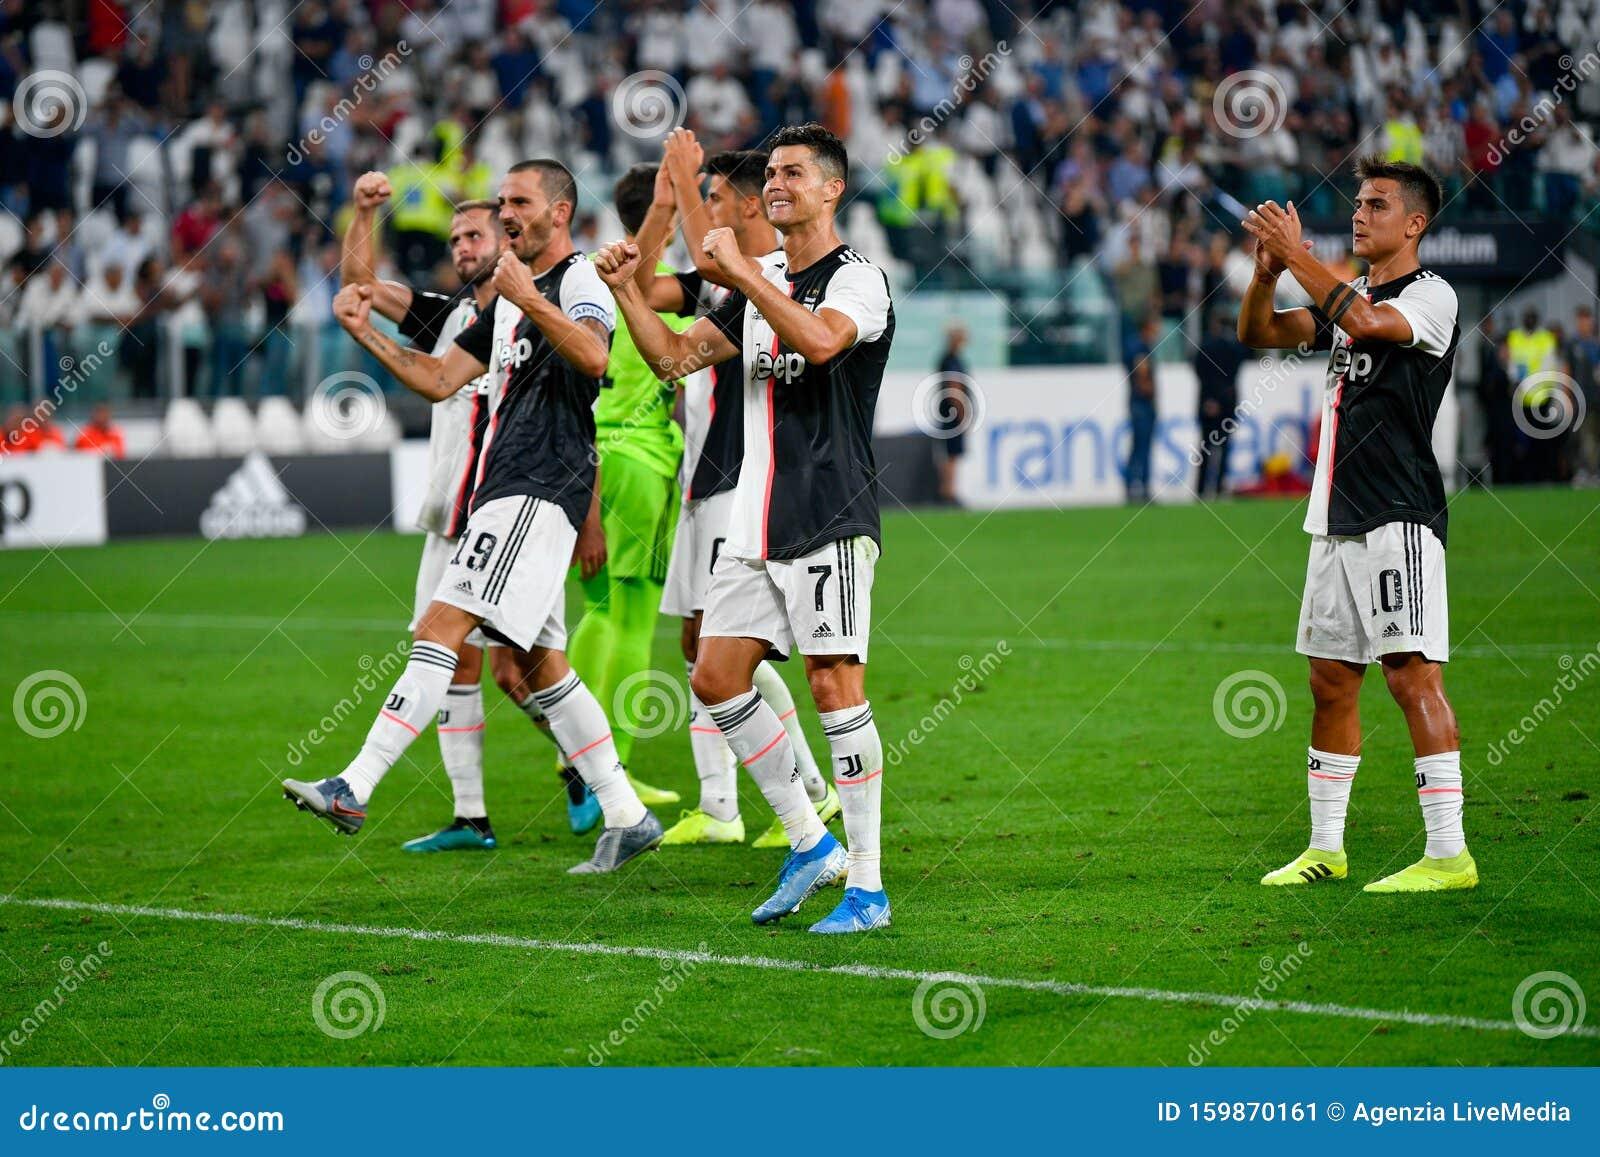 6 170 Juventus Photos Free Royalty Free Stock Photos From Dreamstime